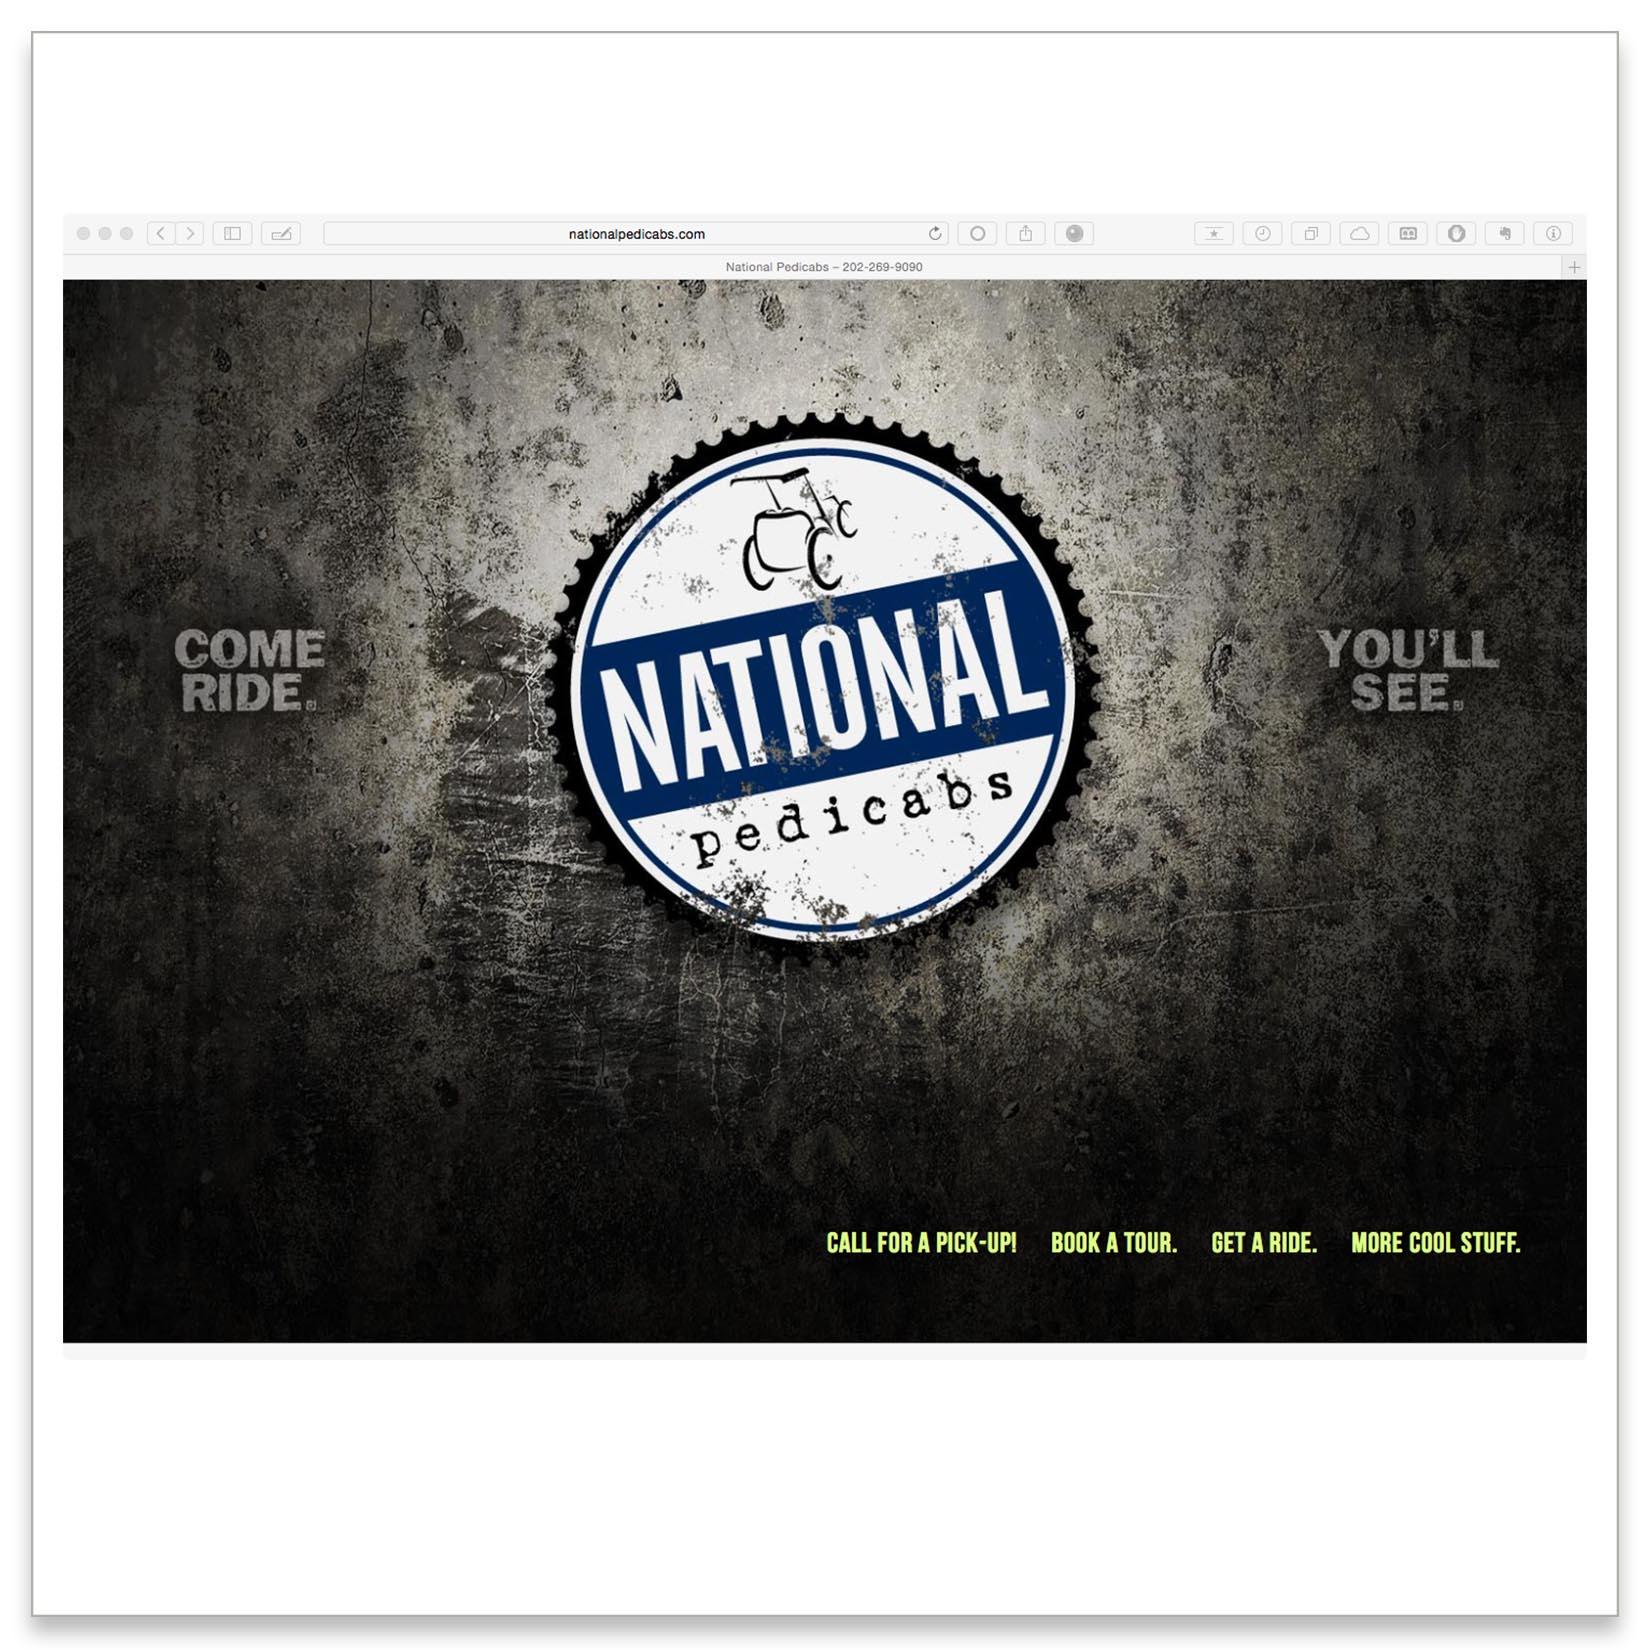 WorkSamples_Pedicab National.jpg